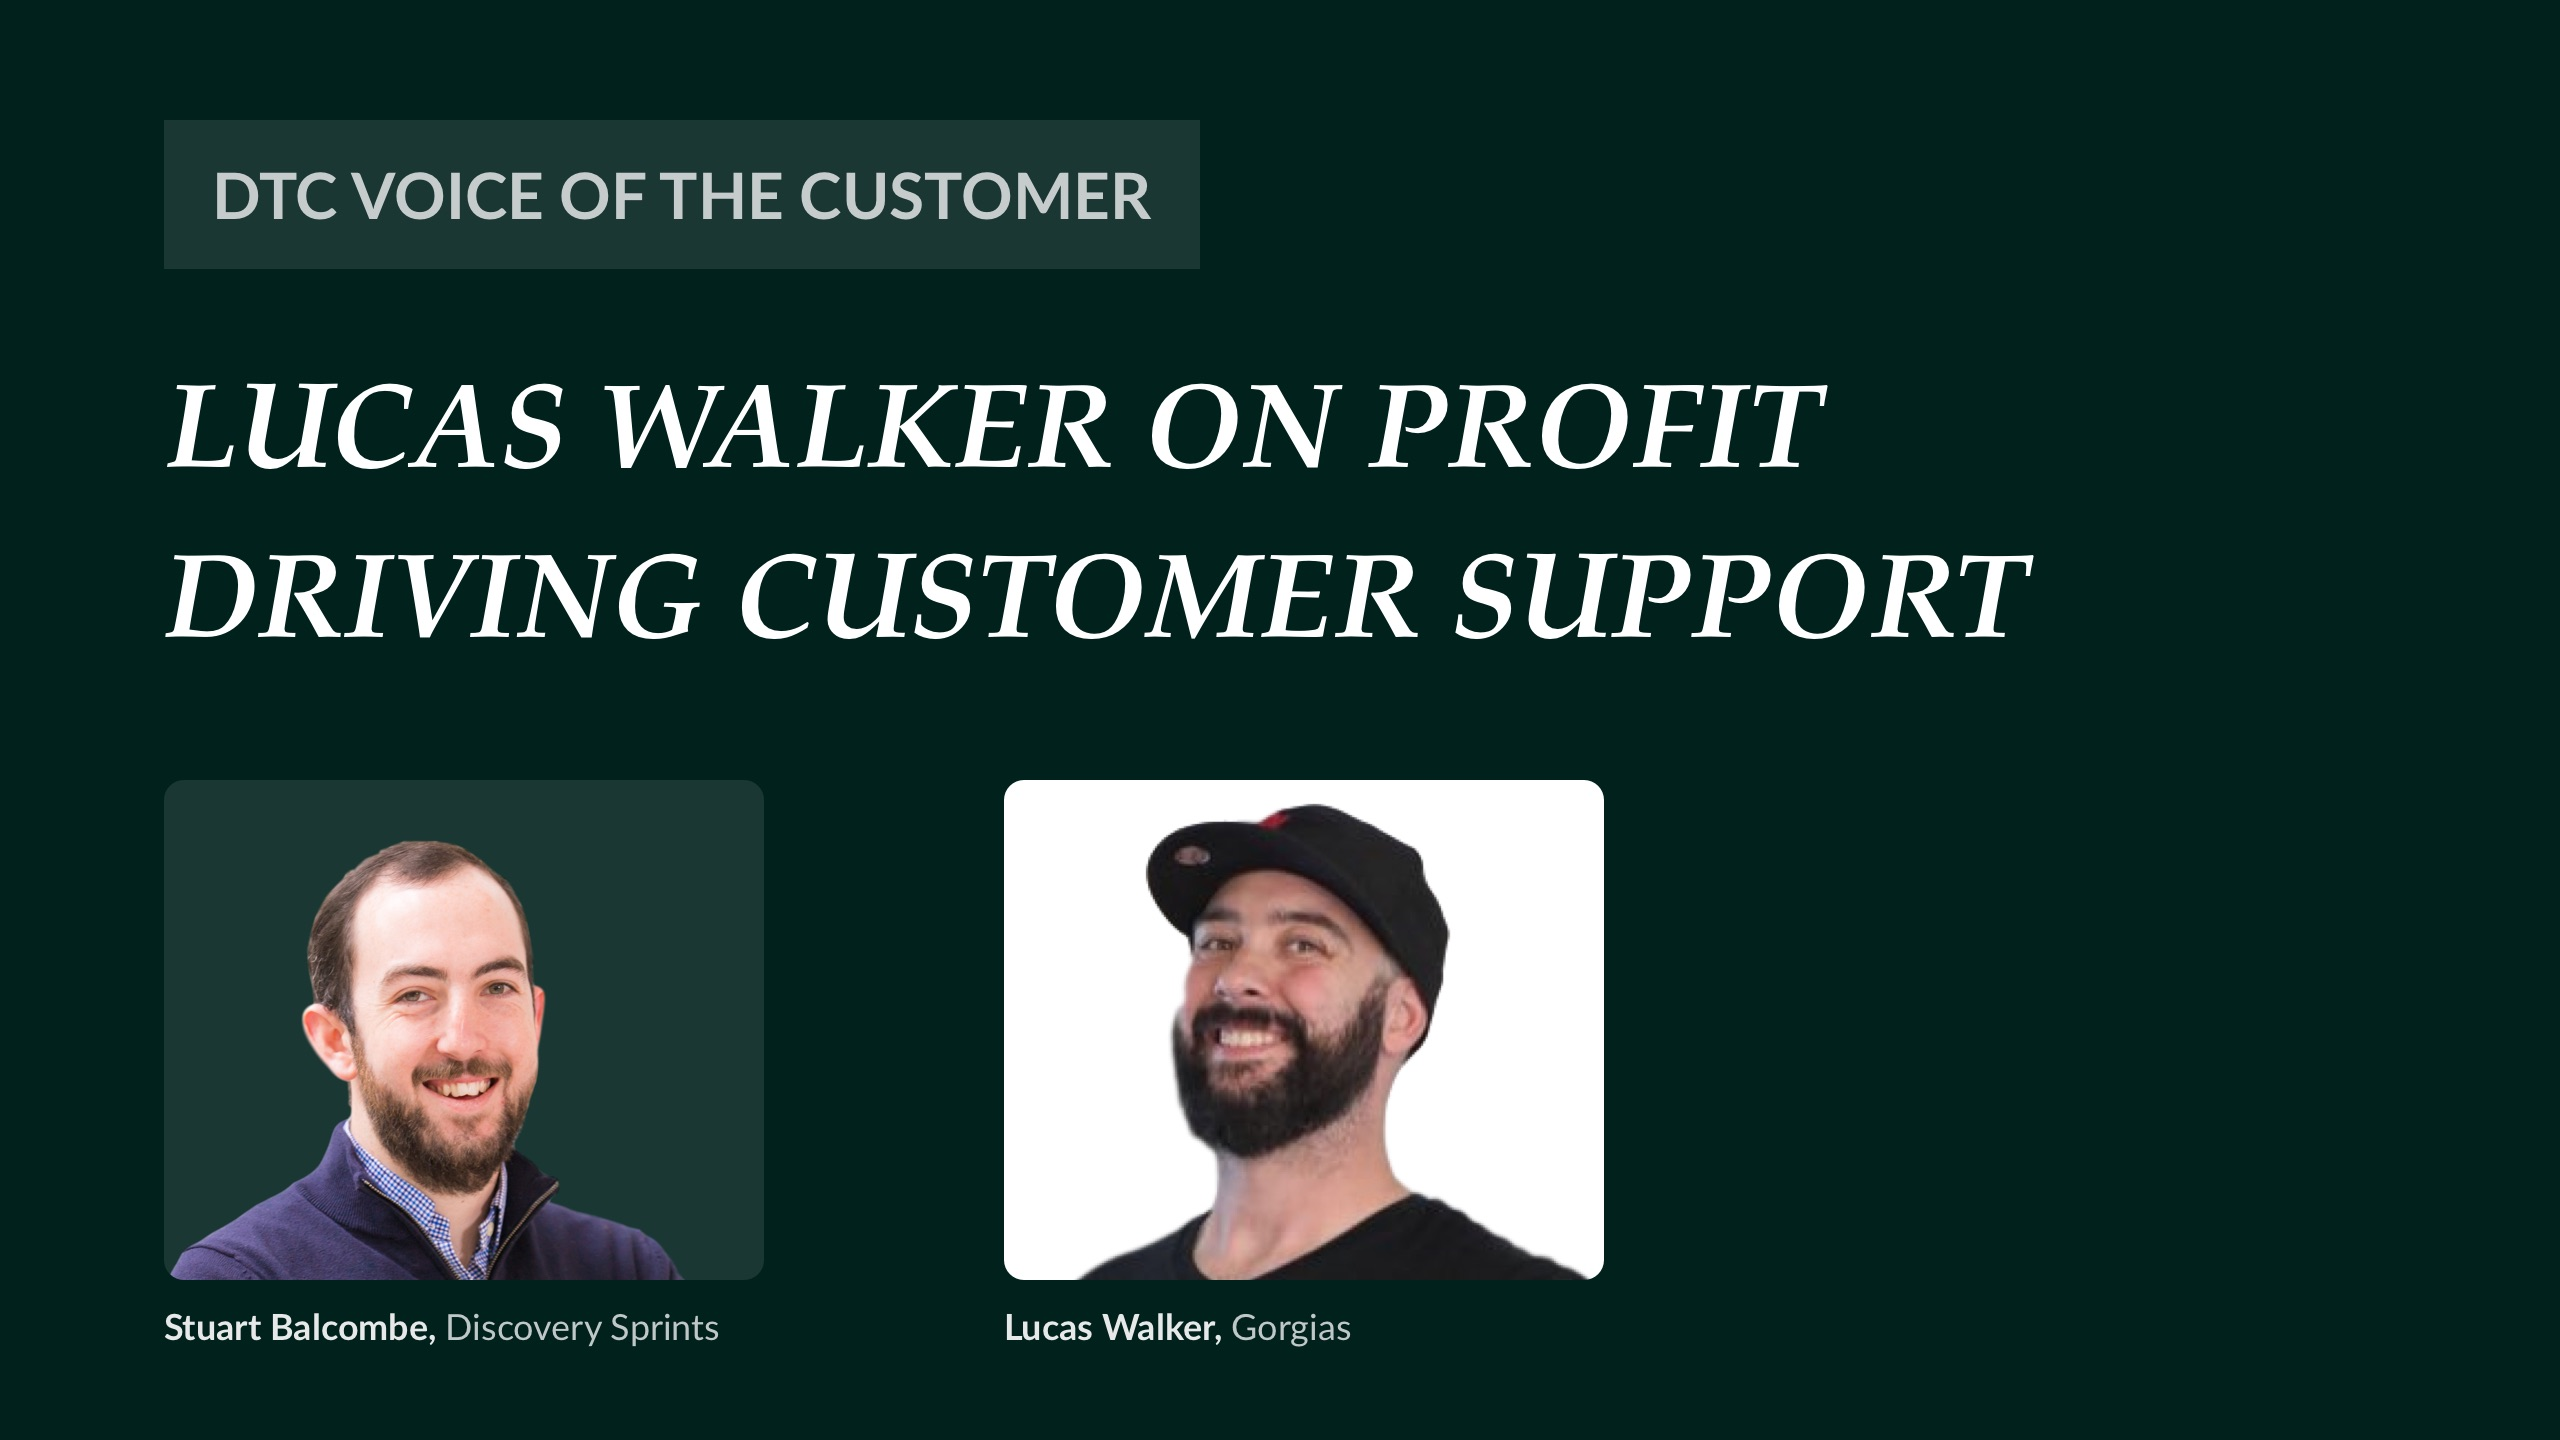 Lucas Walker on profit driving customer support